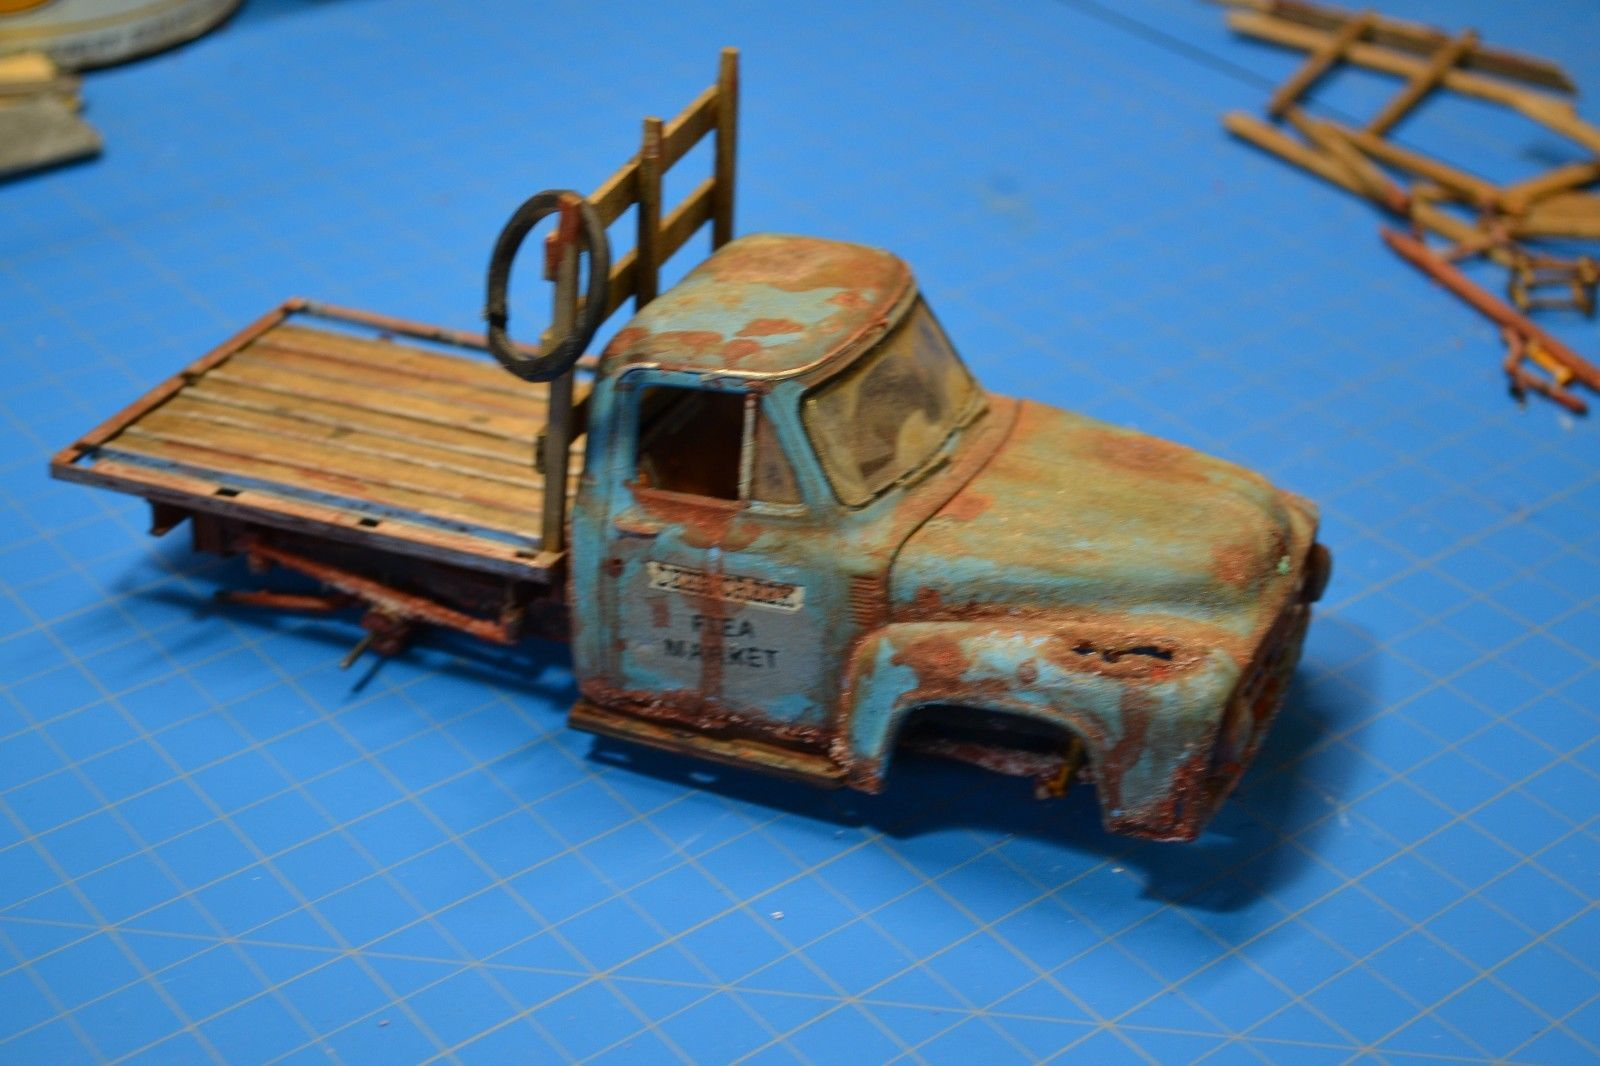 Pro built 1953 53 ford f100 pickup truck weathered detailed diorama flea market ebay